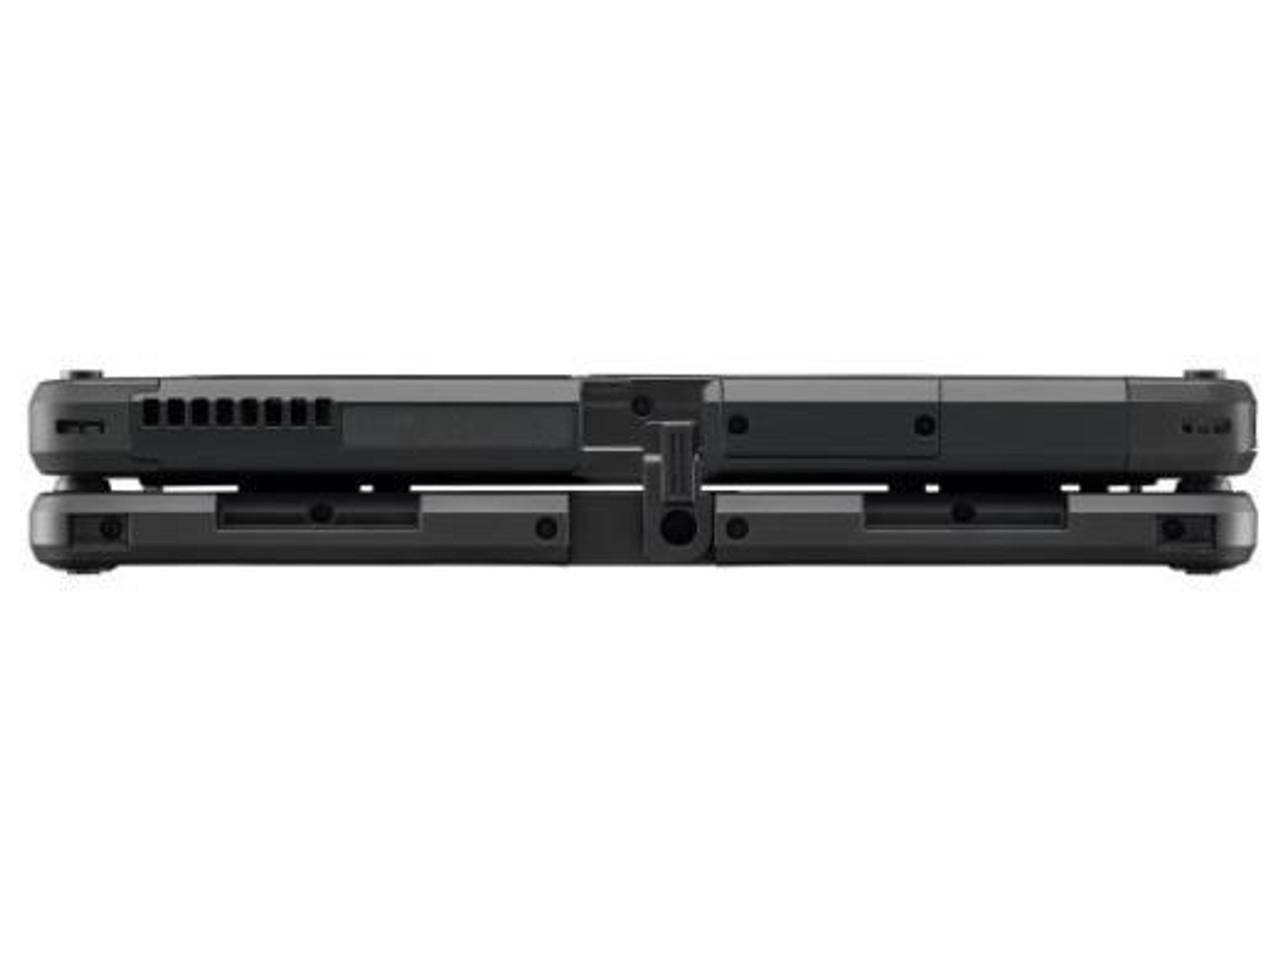 Panasonic CF-33 MK1 side 4